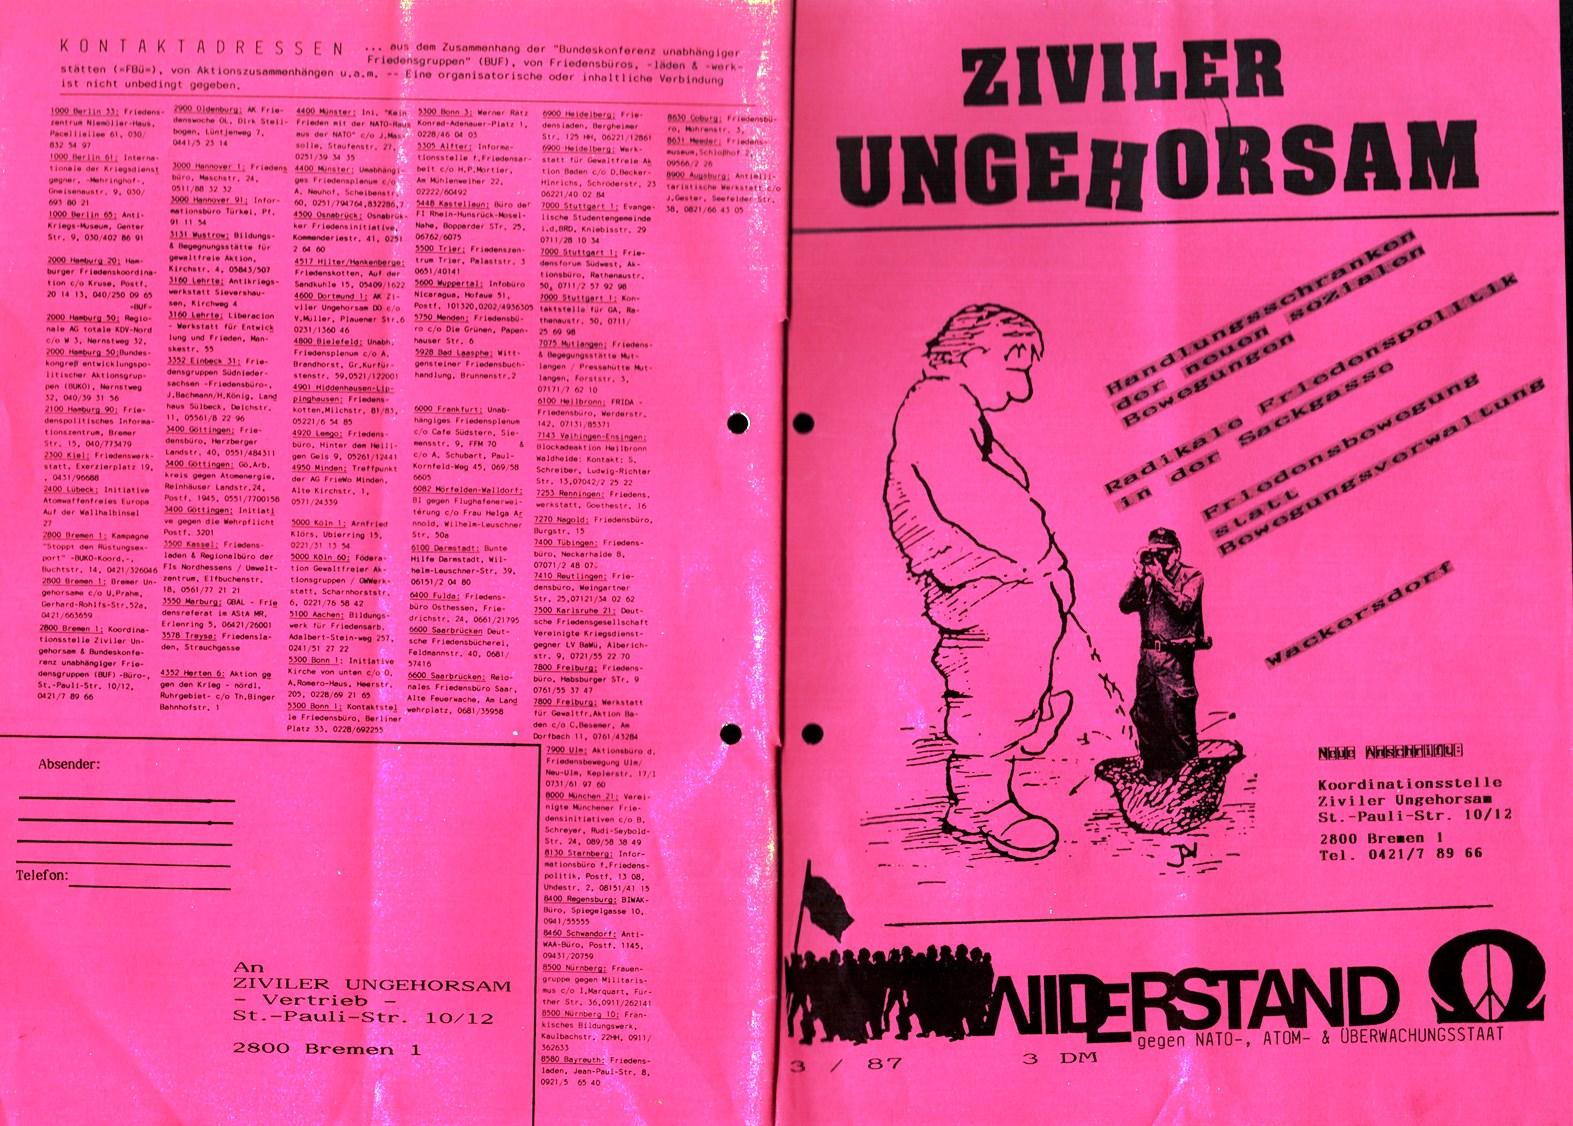 Ziviler_Ungehorsam_1987_003_001